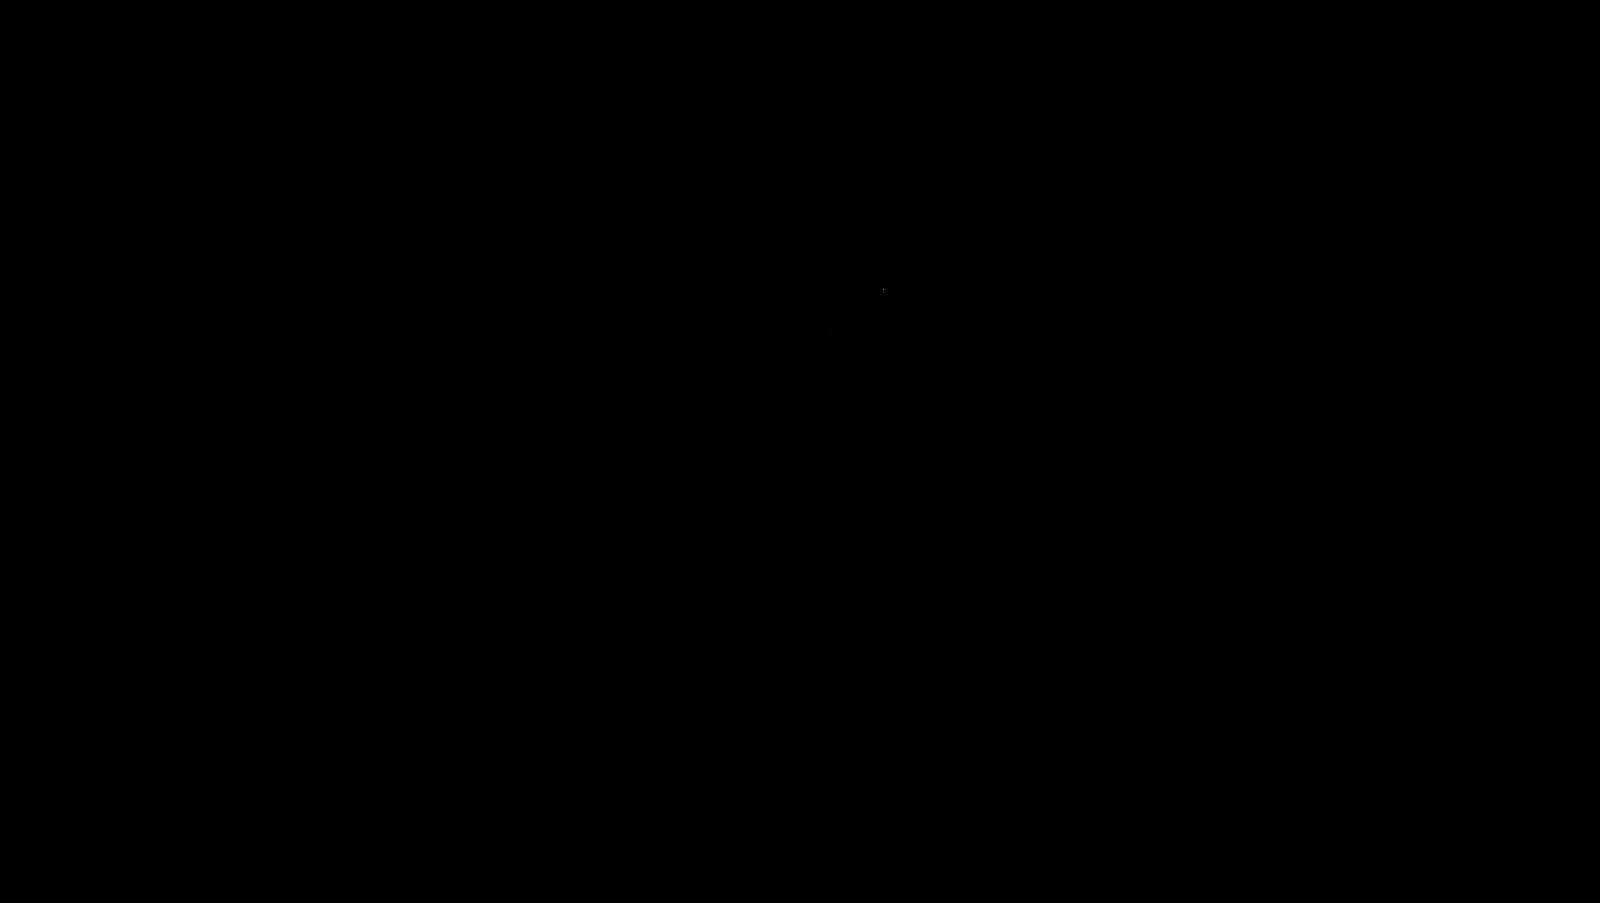 Naruto Shippuden Lineart : Naruto lineart shippuden by kiraka hitomi